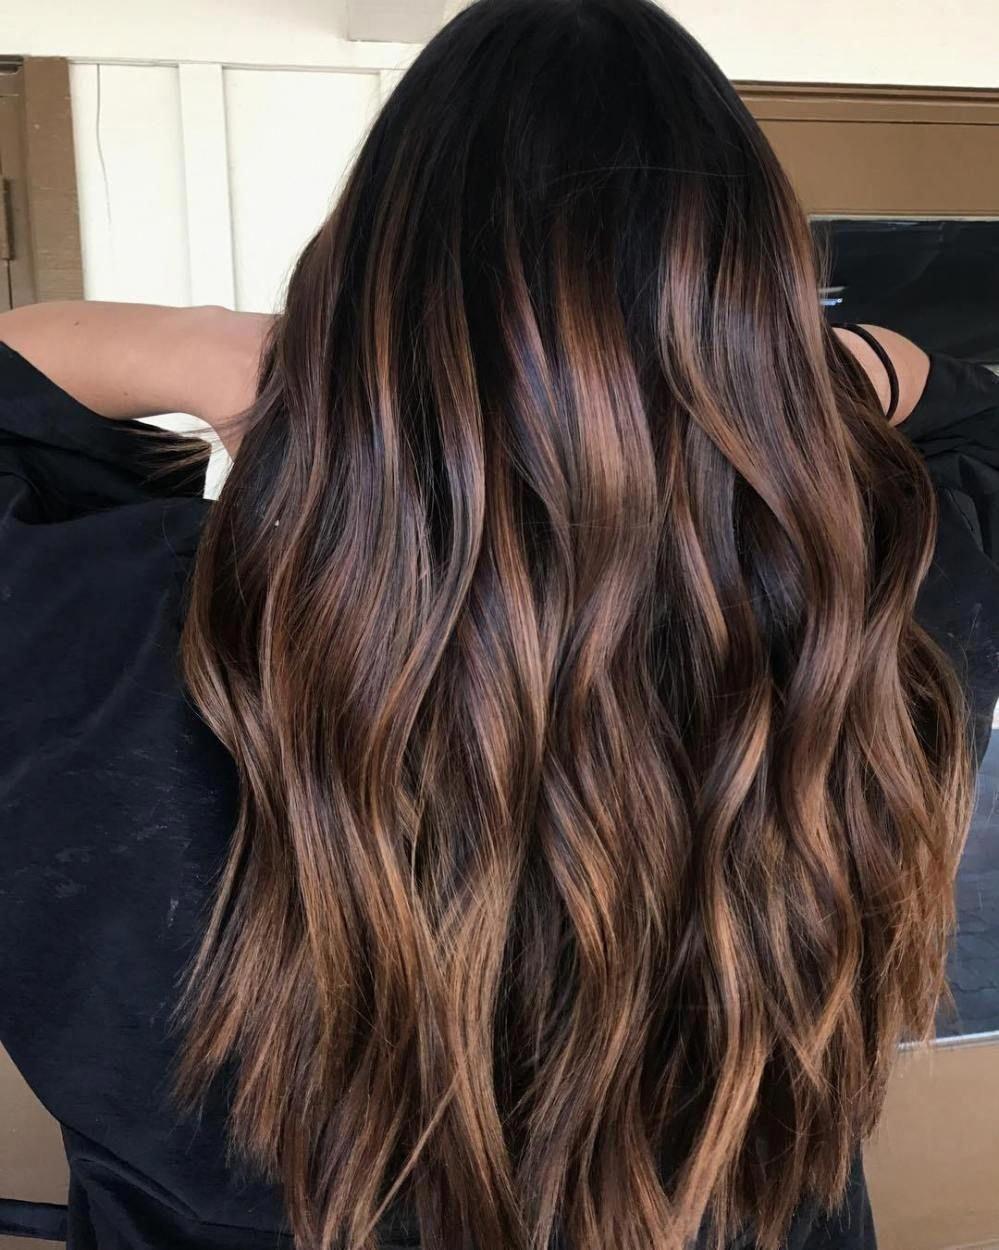 Stylish 44 Cool Brown Hair Caramel Highlights Ideas To Try Chocolatebrownhair Brownhair Hair Color For Black Hair Hair Styles Brown Black Hair Color